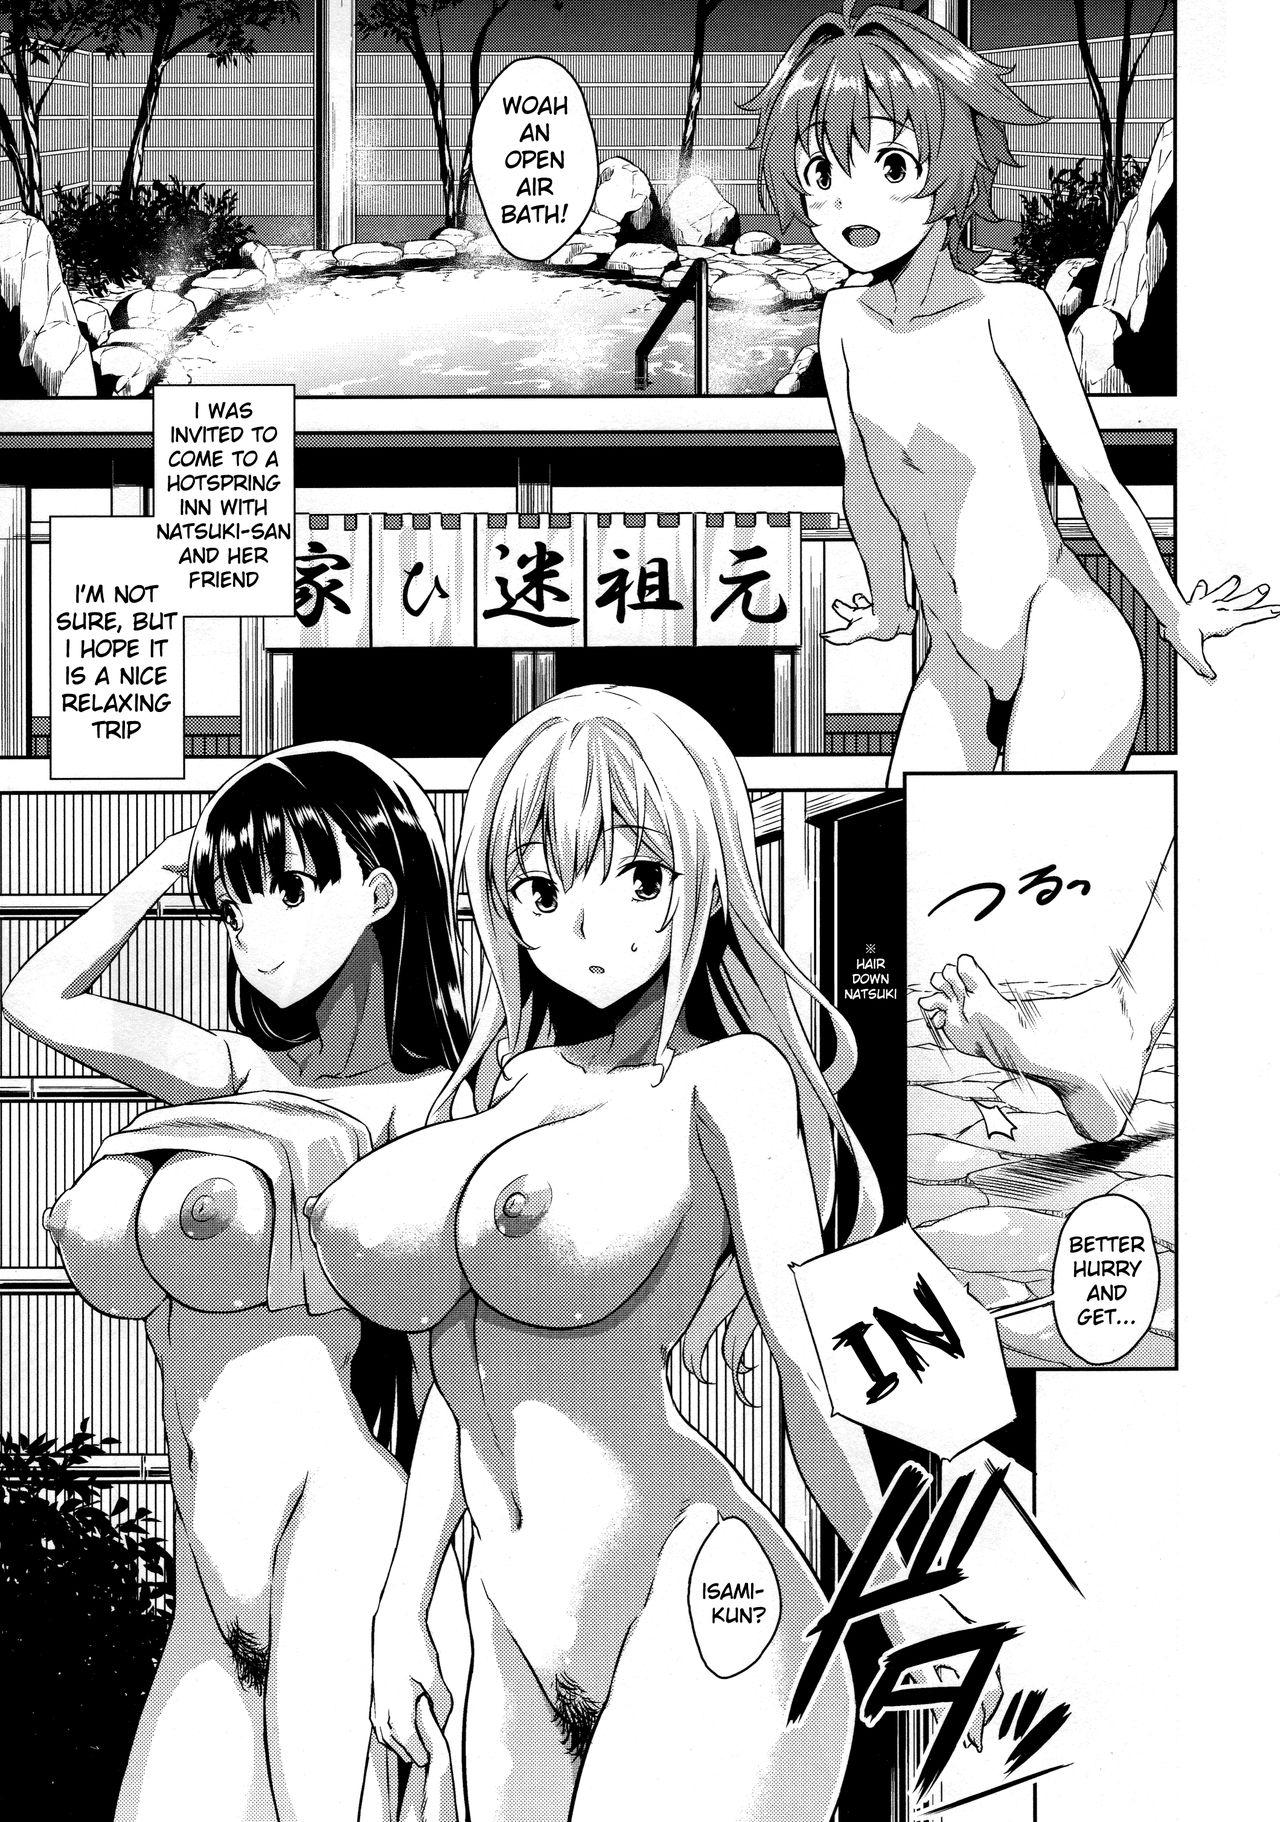 (C92) [Σ-Arts (Mikemono Yuu)] Mayoiga no Onee-san OVA-ka Kinengou Monochro Hen [English] [Clawhammer] 1